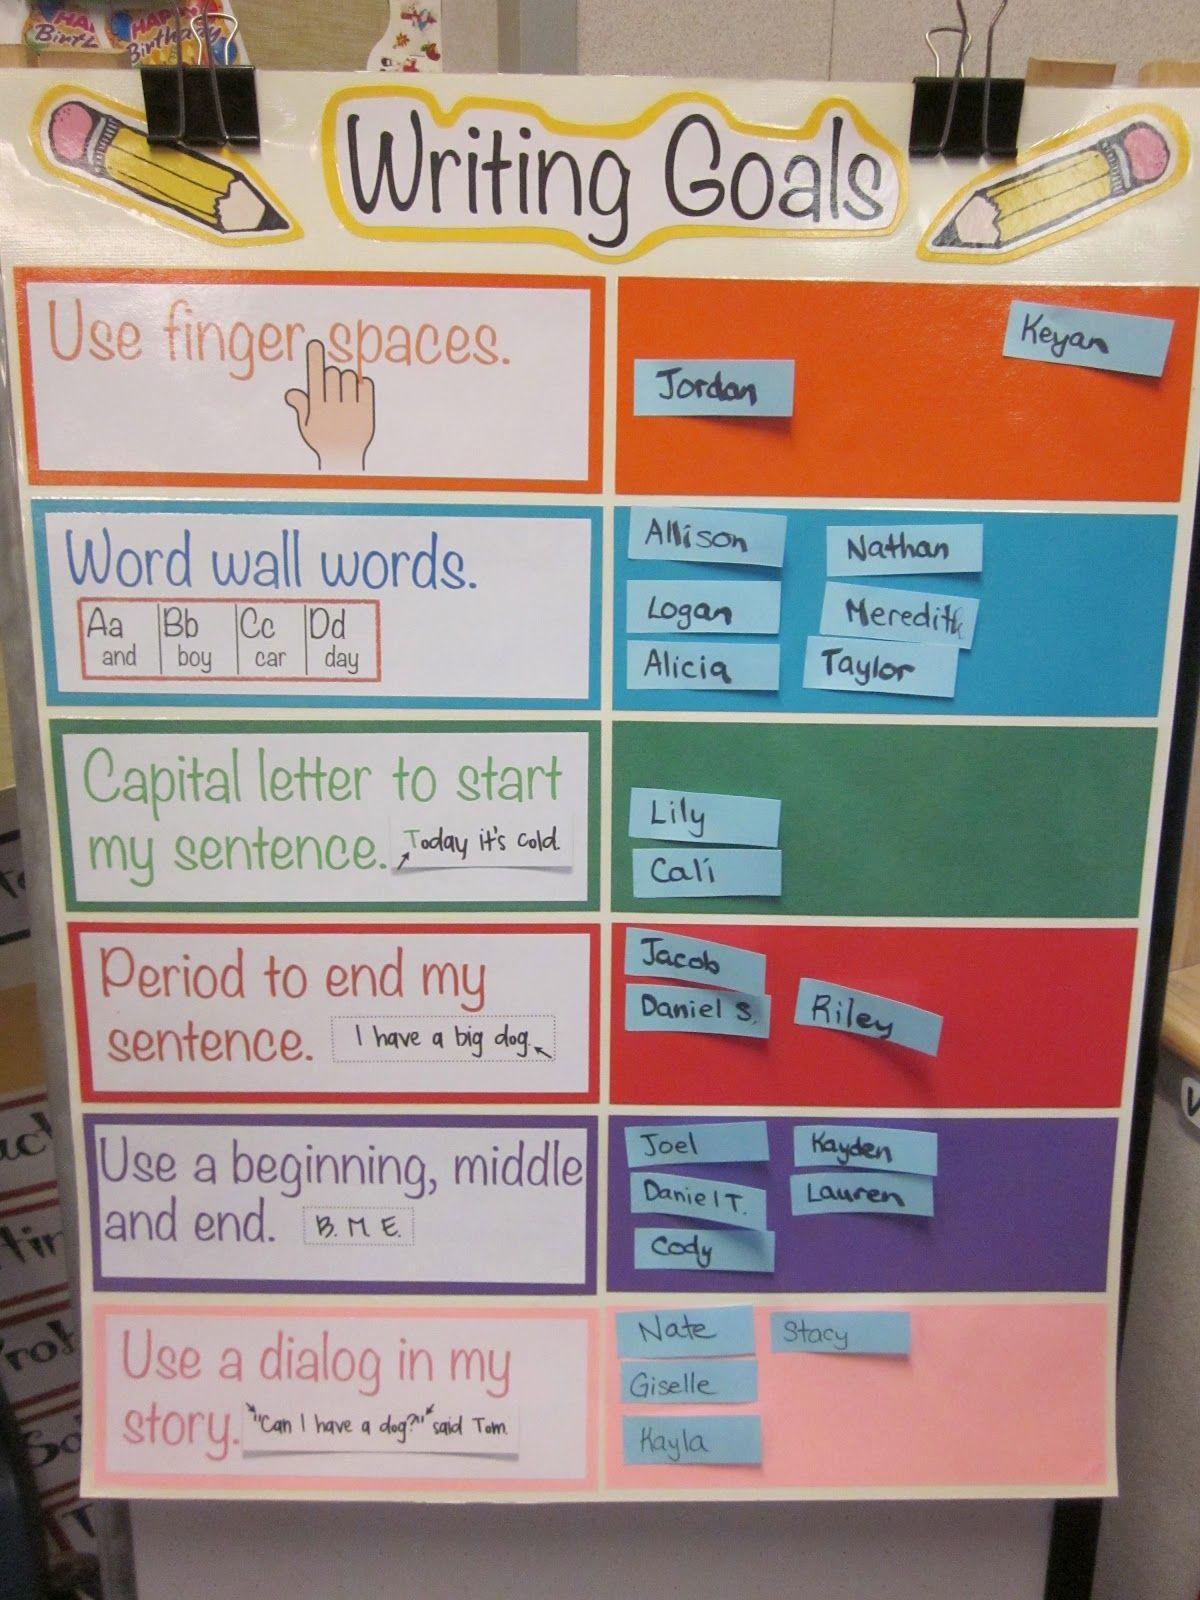 Writing Goals poster